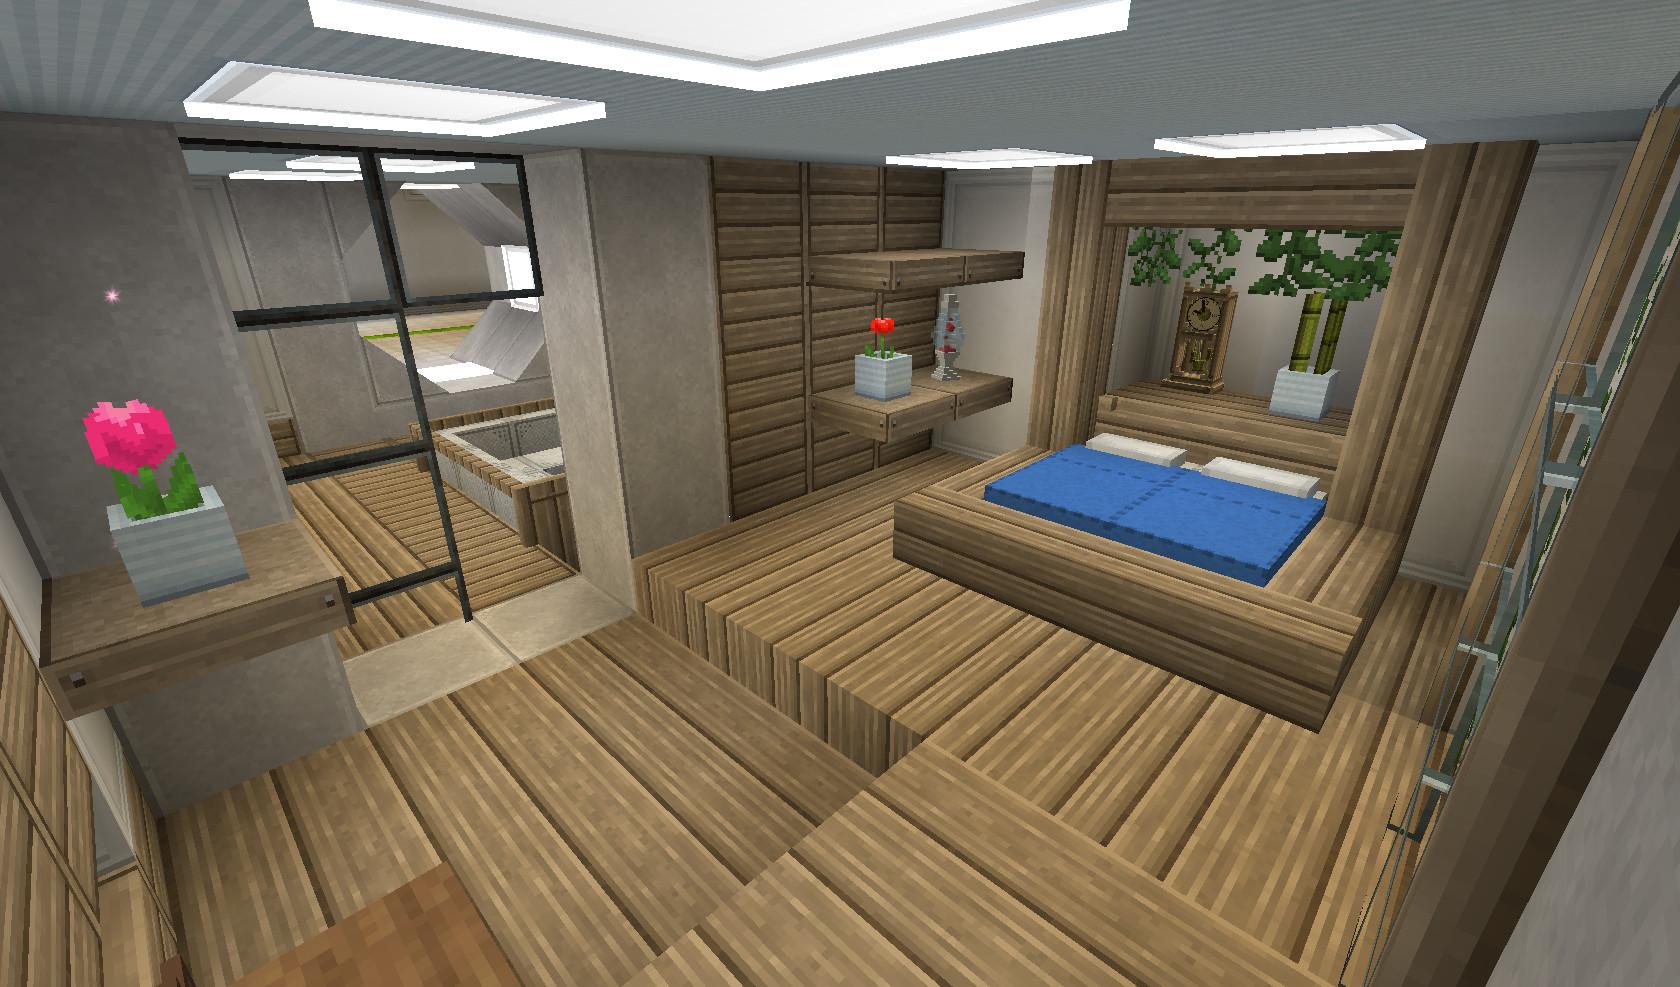 hardwood floor refinishing in memphis tn of http imgur com gallery 0ymjwqq weekly http imgur com 0ymjwqq in pbrveri